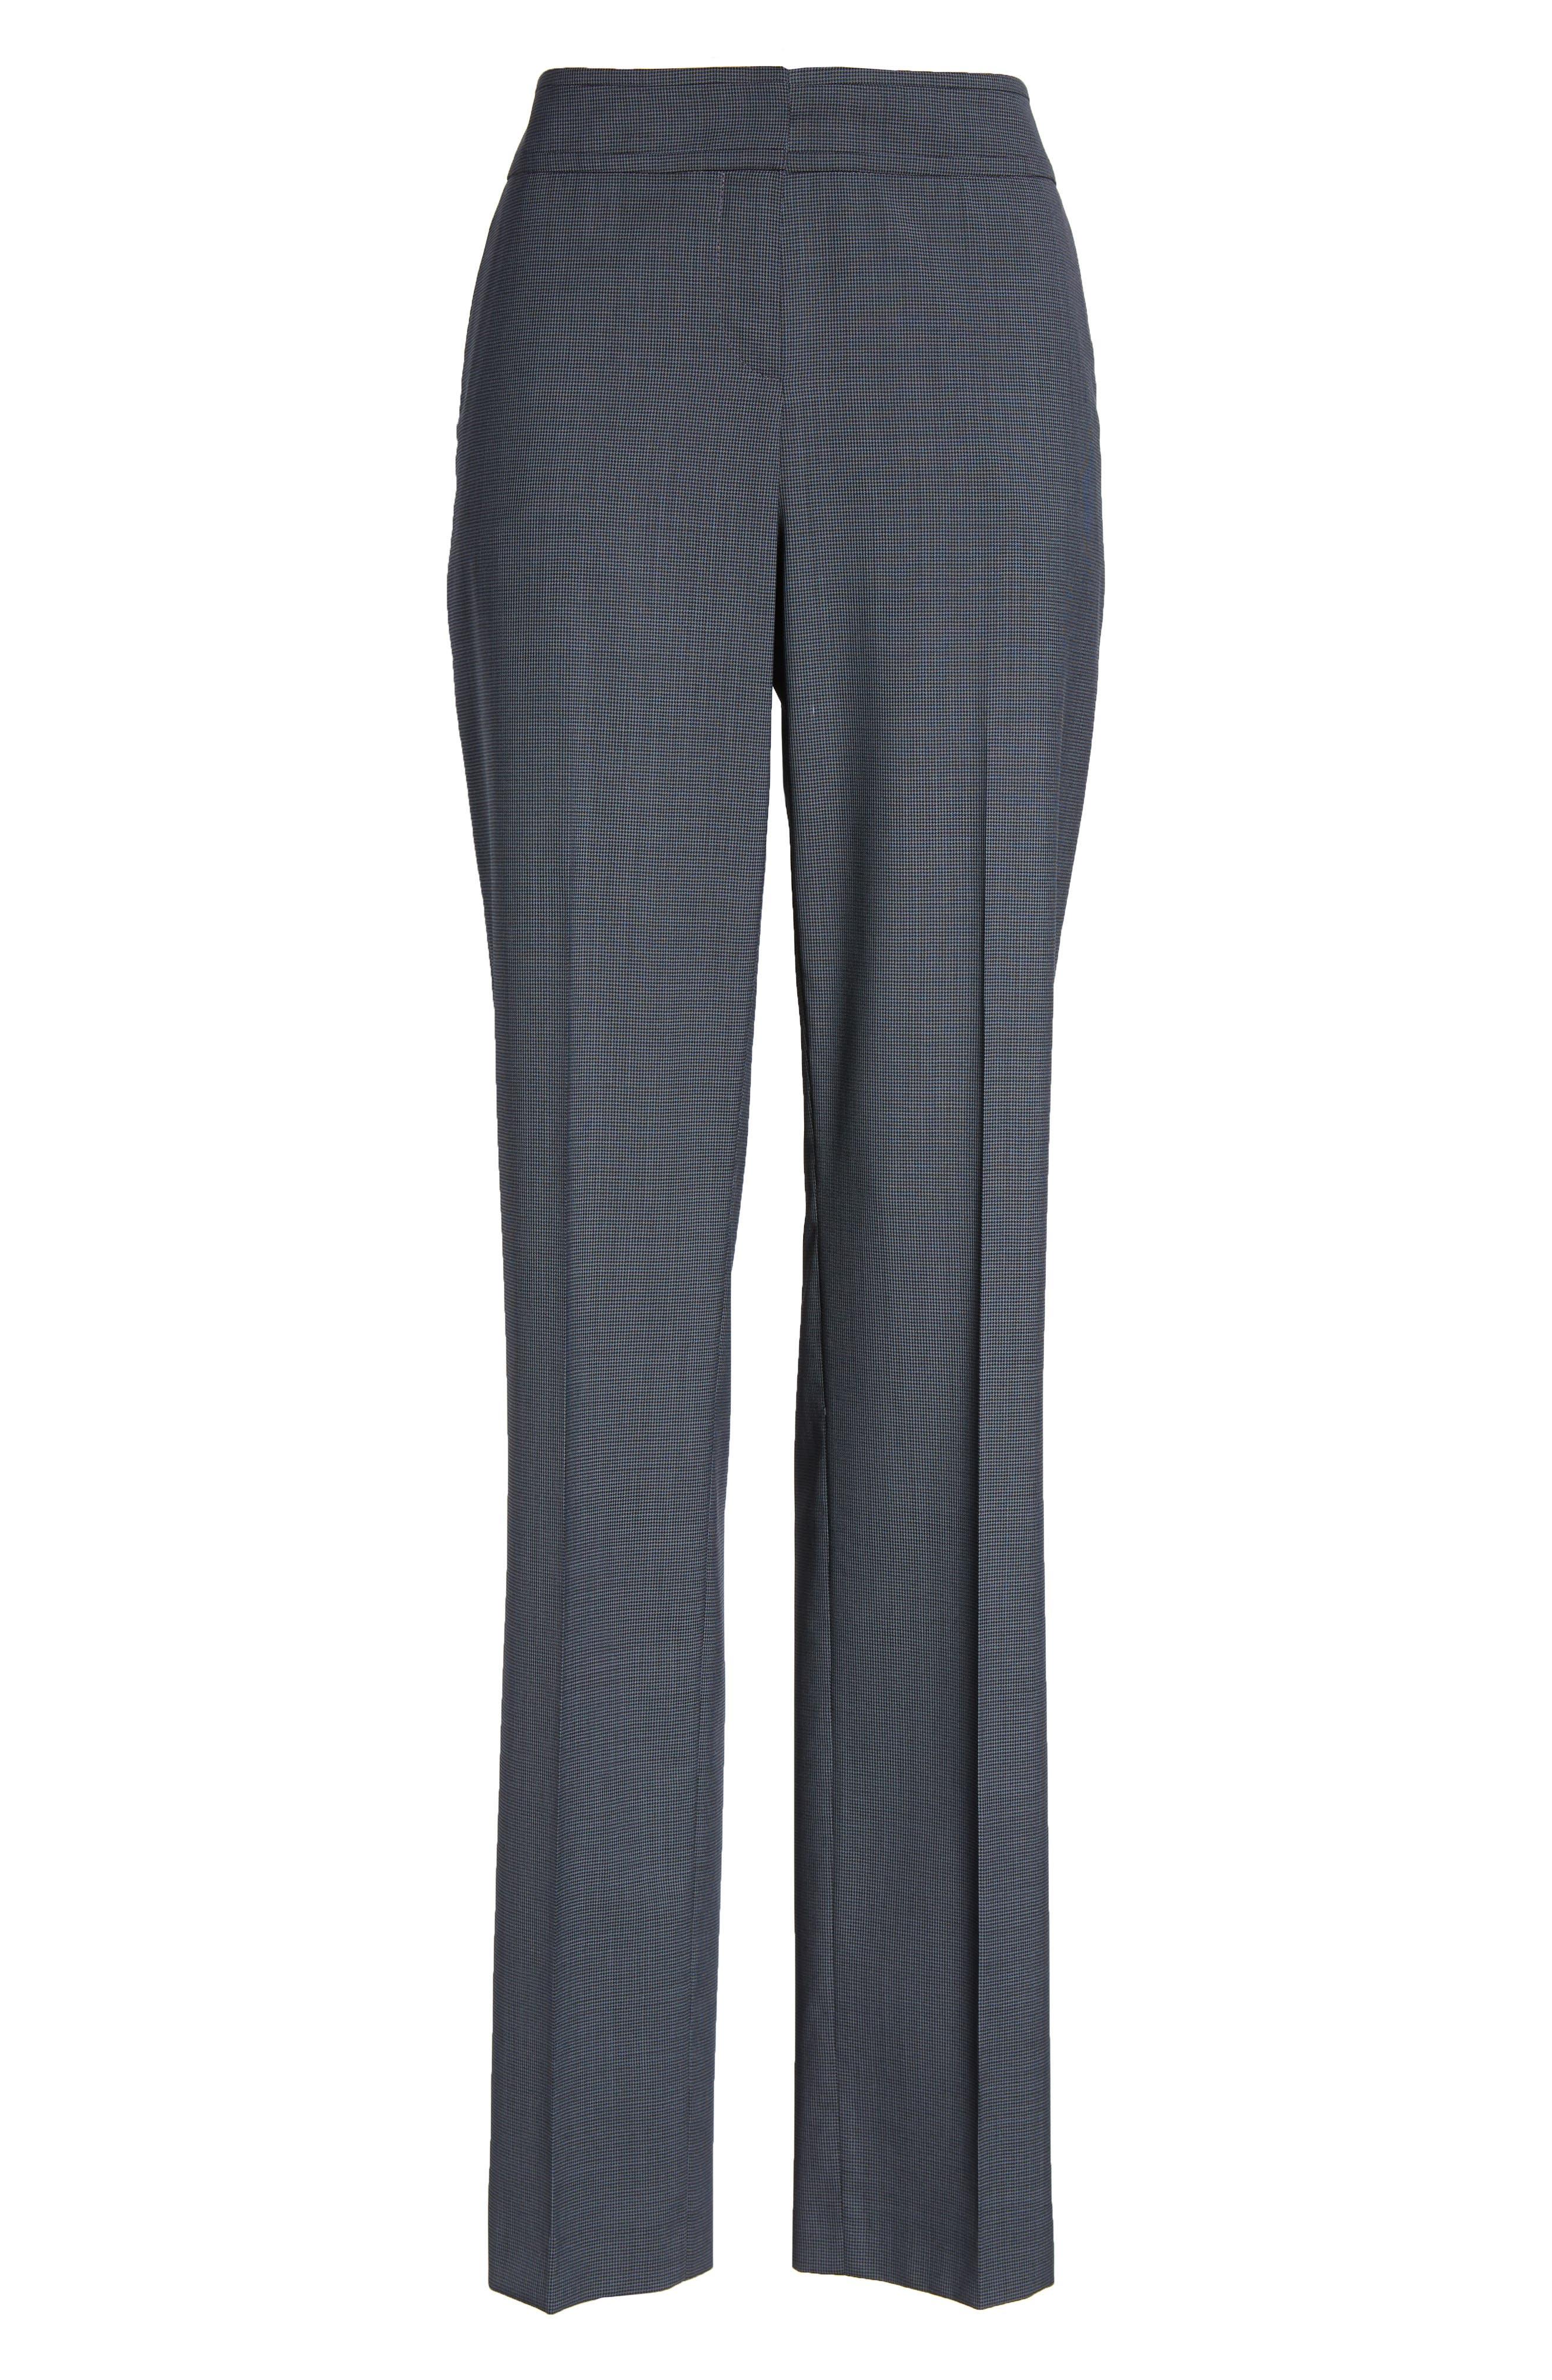 Talouise Pepita Stretch Wool Suit Pants,                             Alternate thumbnail 6, color,                             462